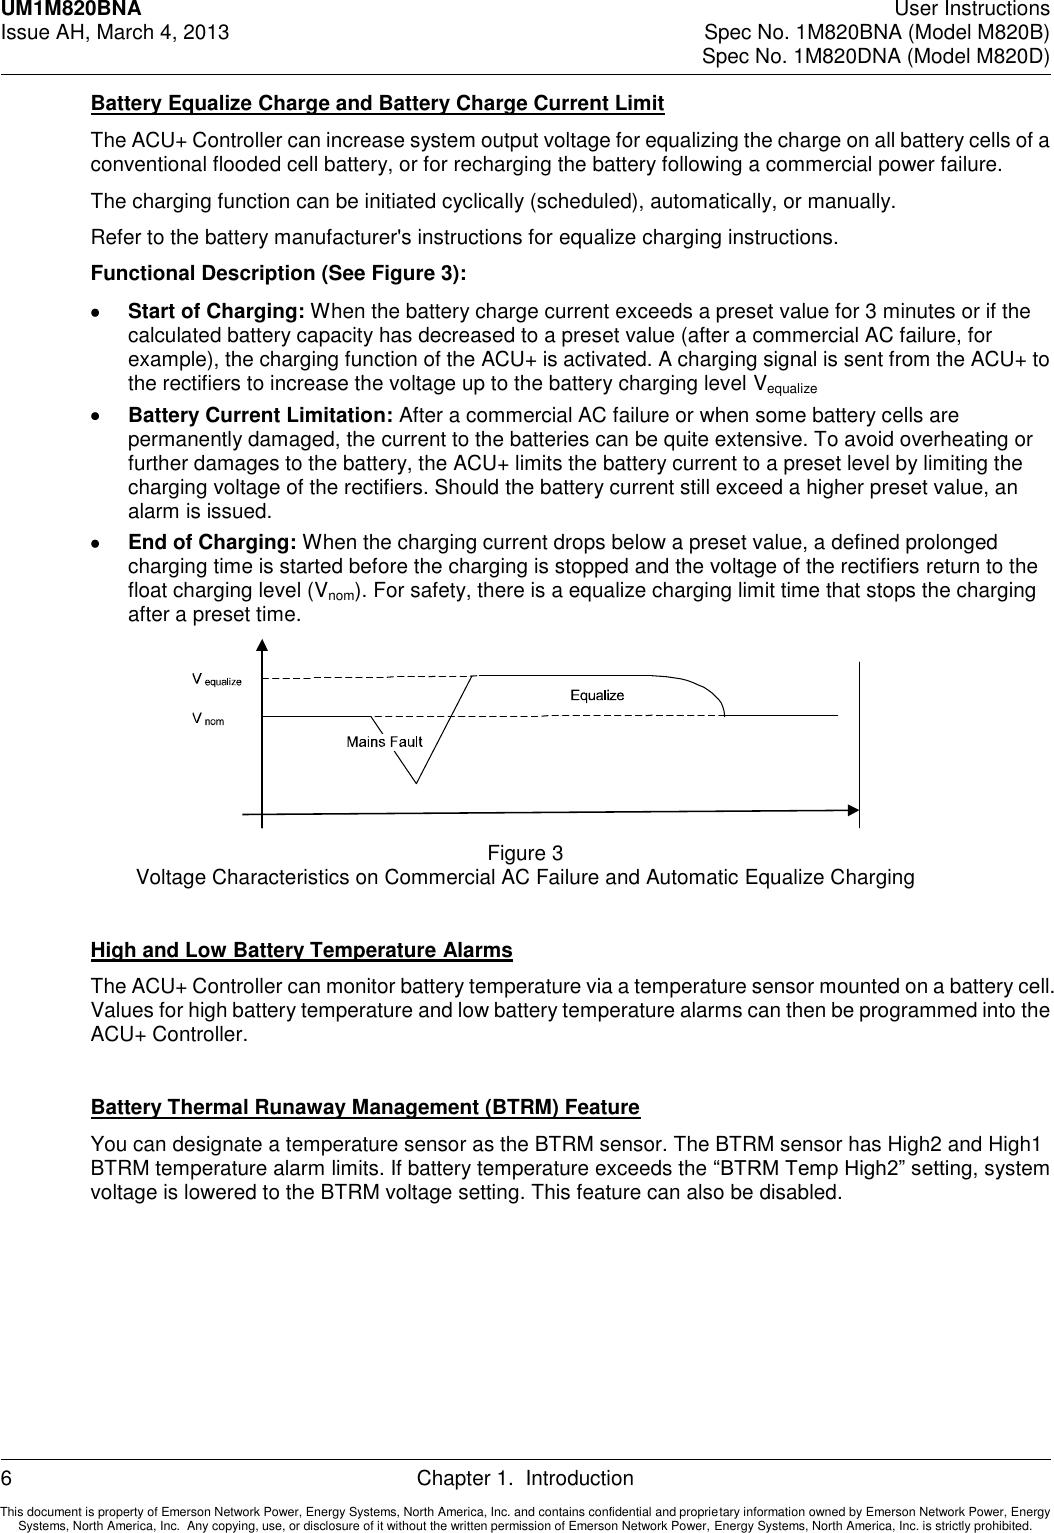 Emerson M820B Users Manual